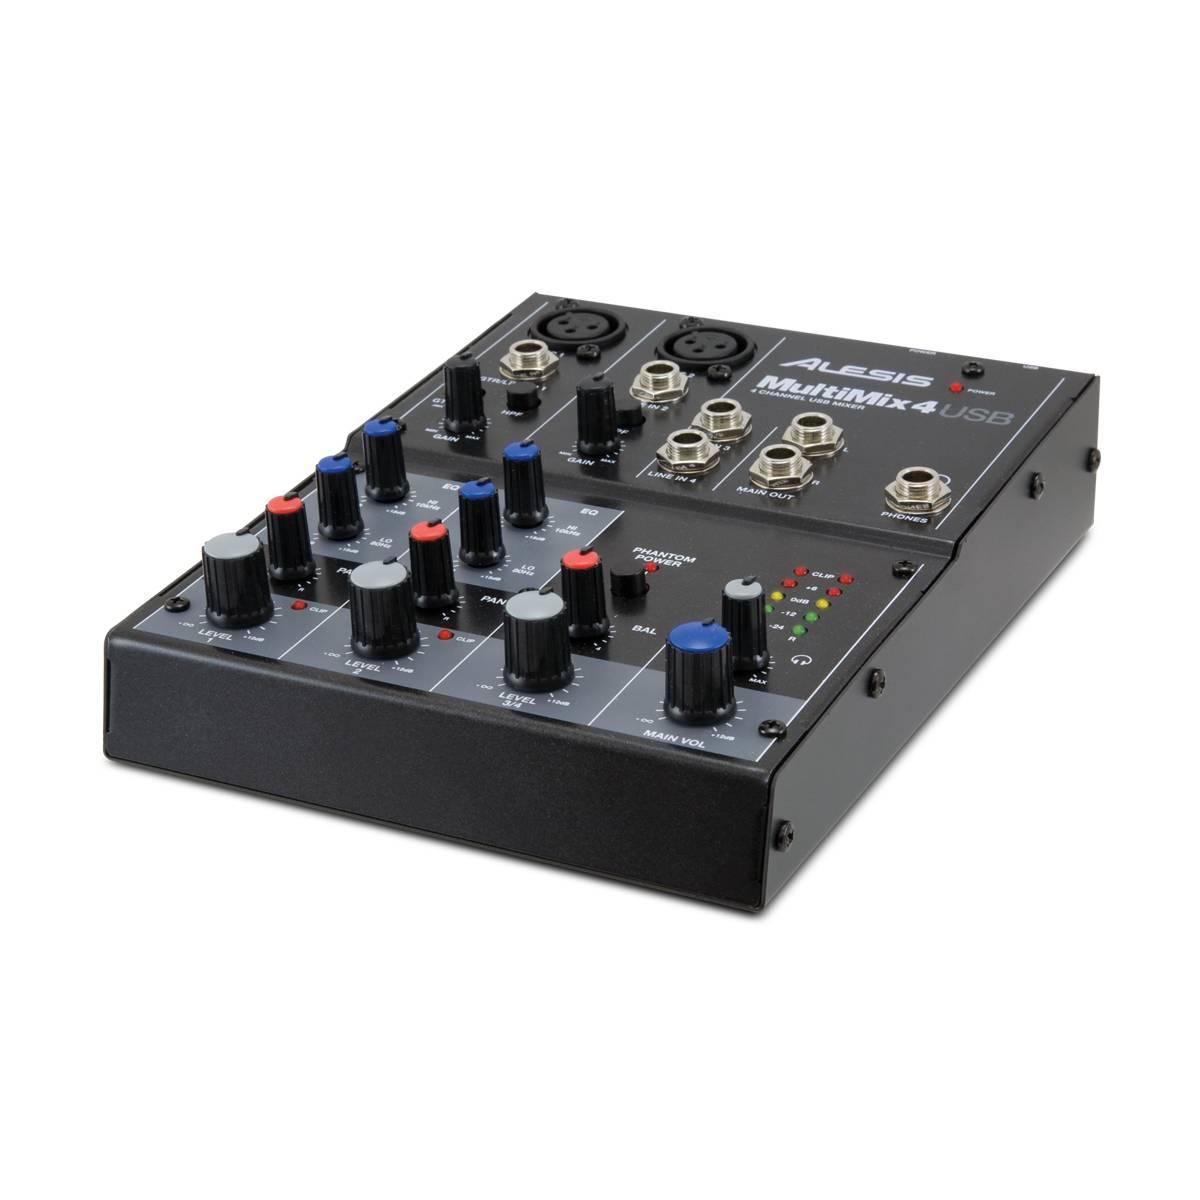 alesis multimix 4 usb mixer audio interface. Black Bedroom Furniture Sets. Home Design Ideas